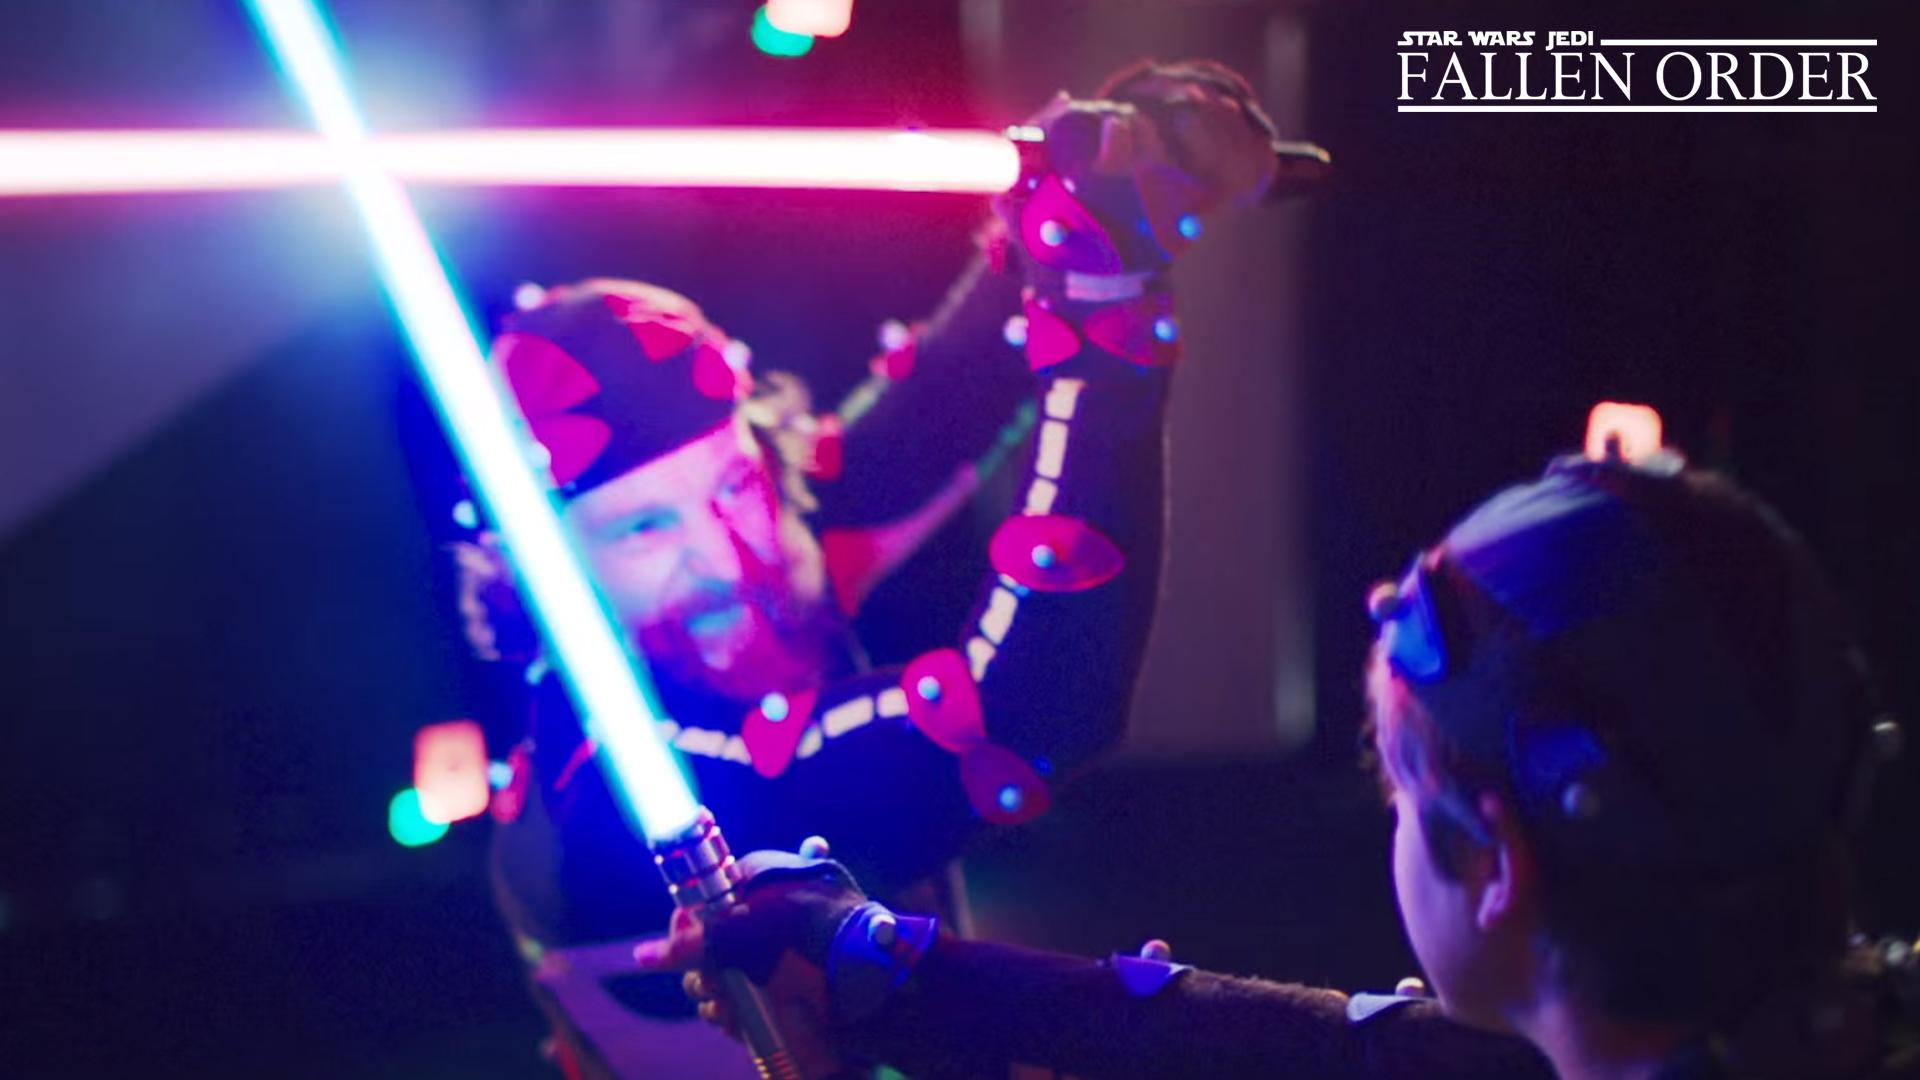 Star Wars Jedi Fallen Order Video Game 2019 Photo Gallery Imdb